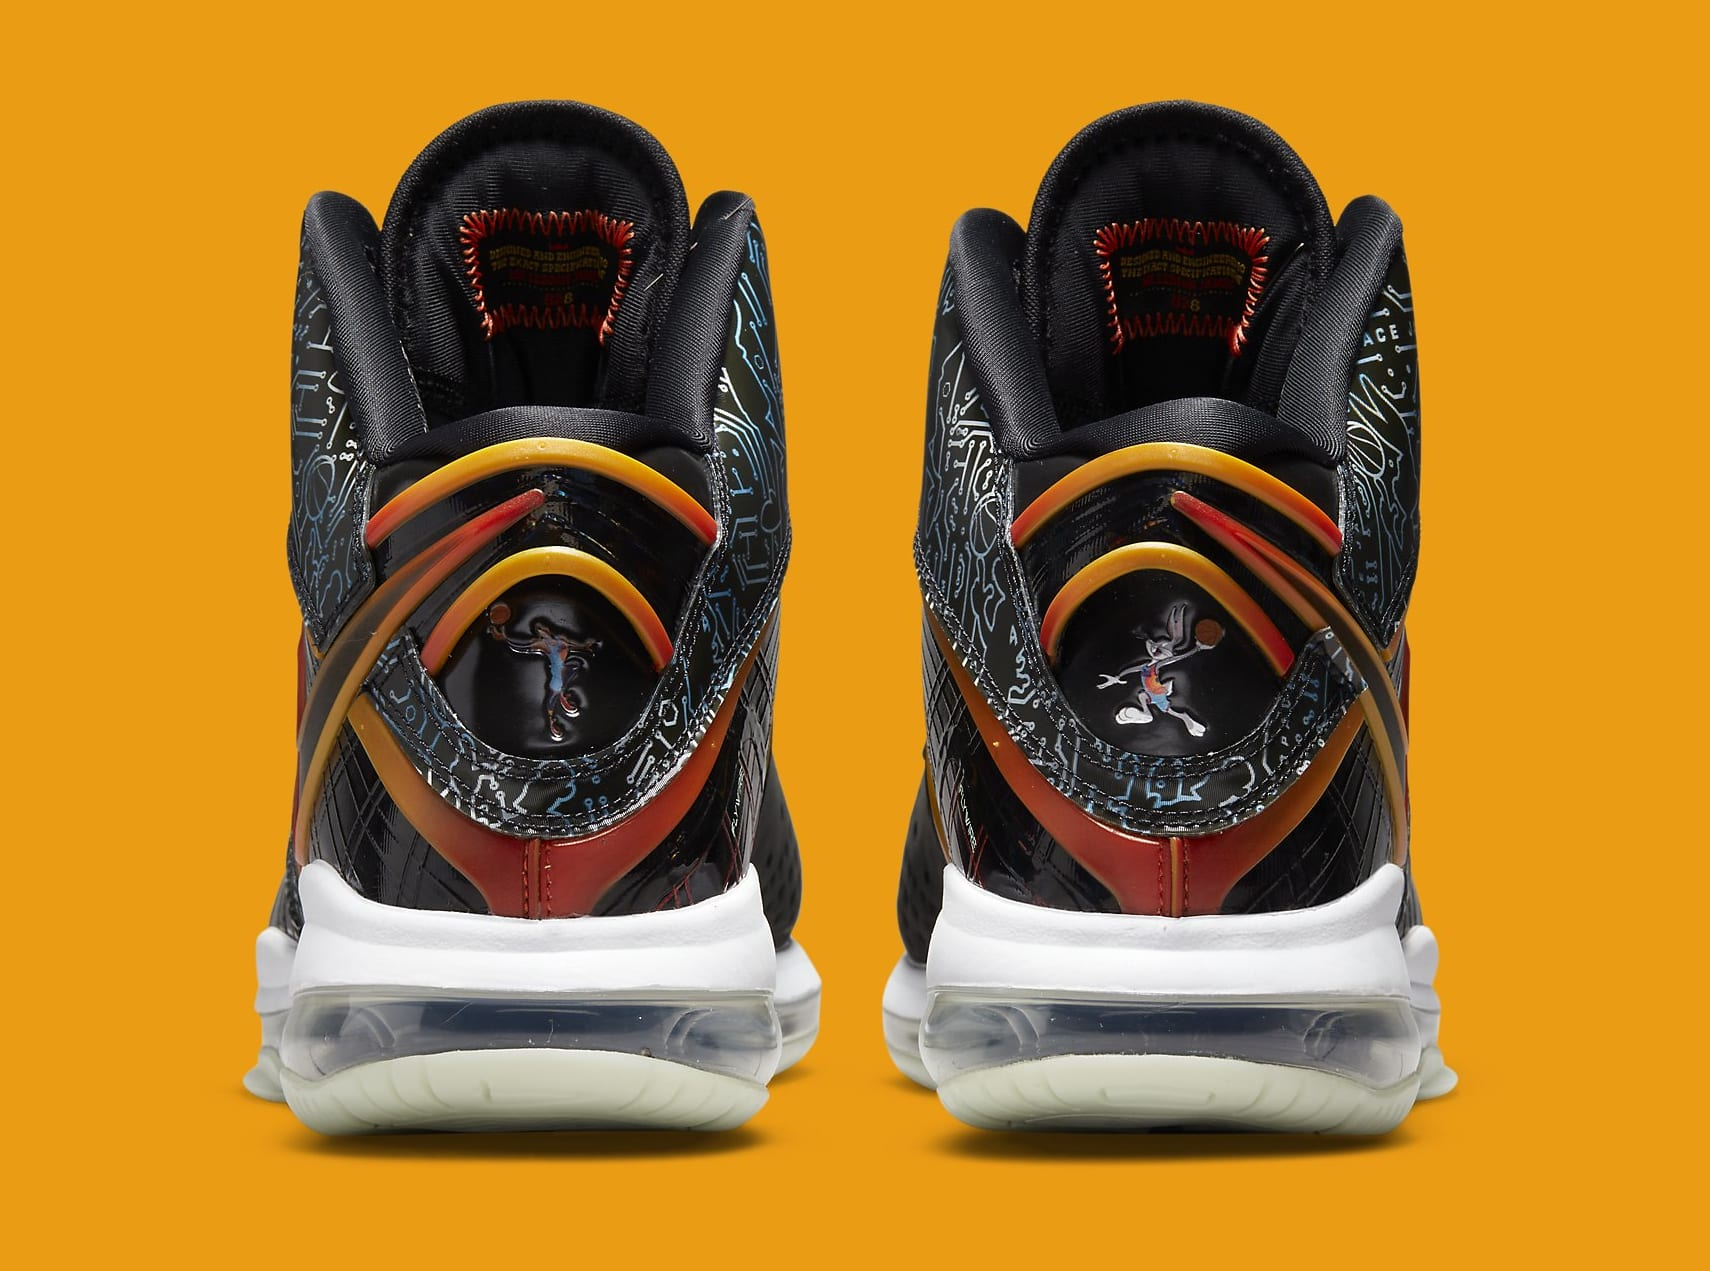 Nike LeBron 8 'Space Jam' DB1732-001 Heel